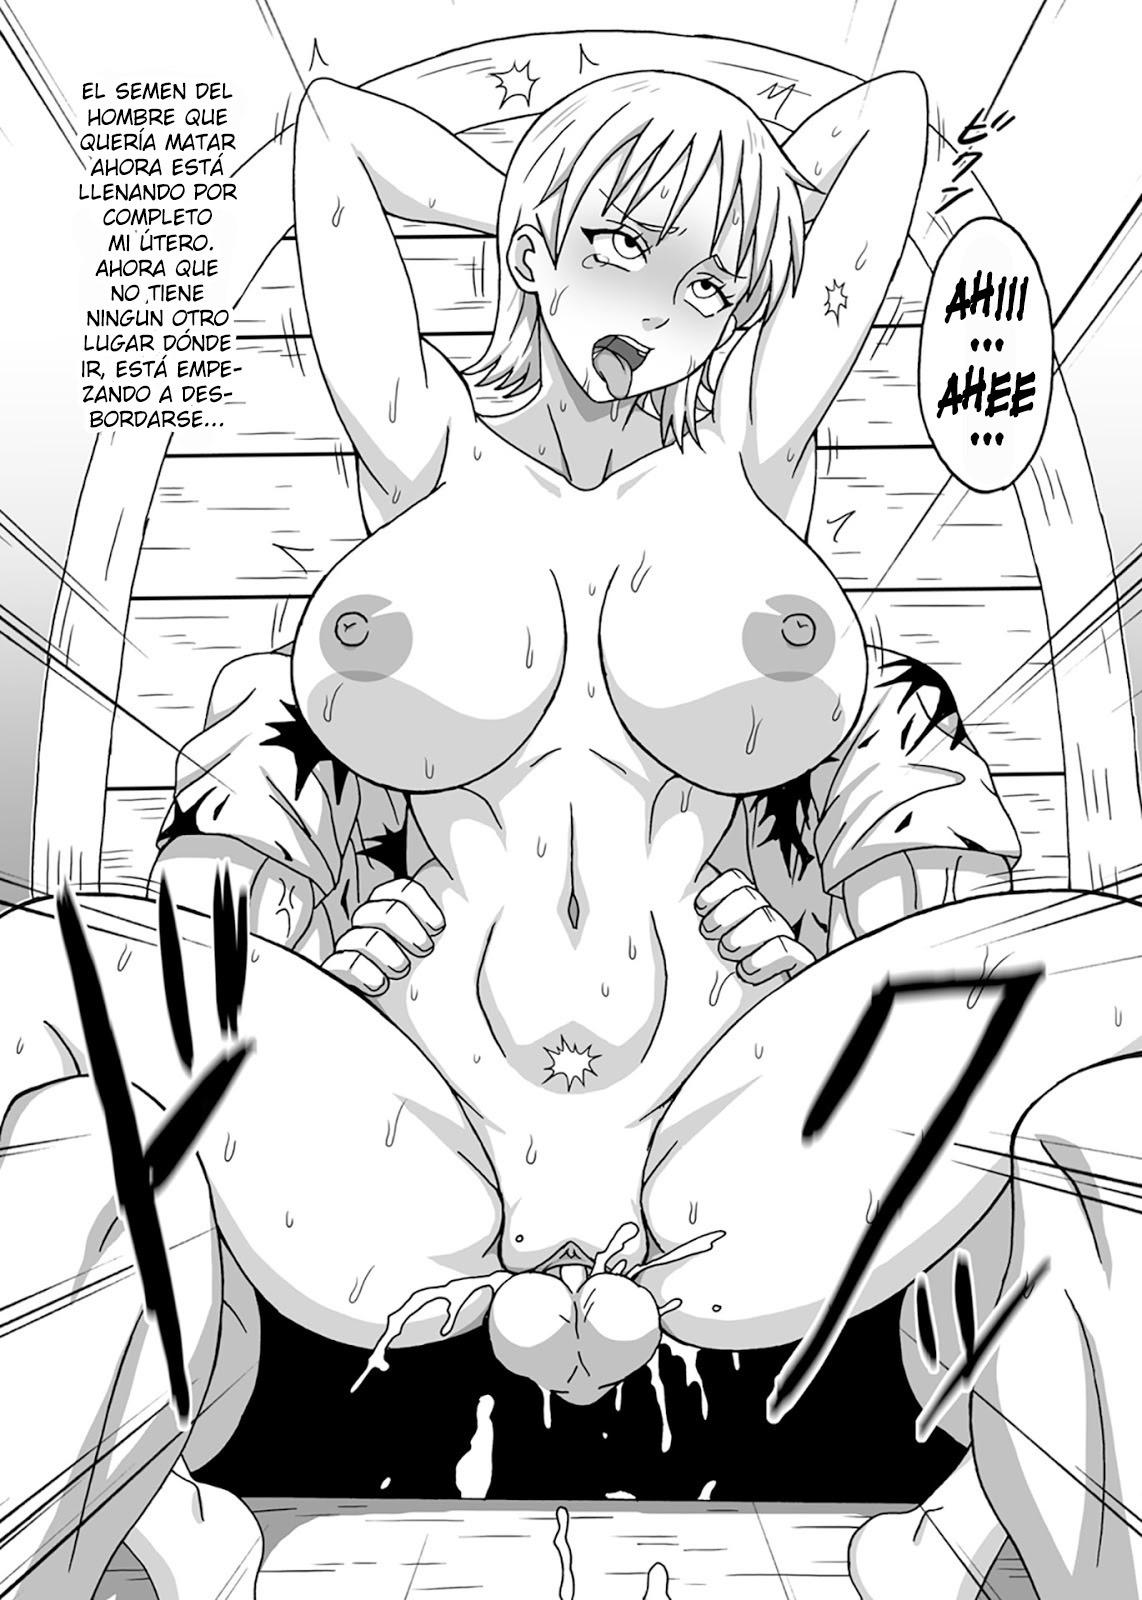 Nami-SAGA-3-One-Piece-29.jpg